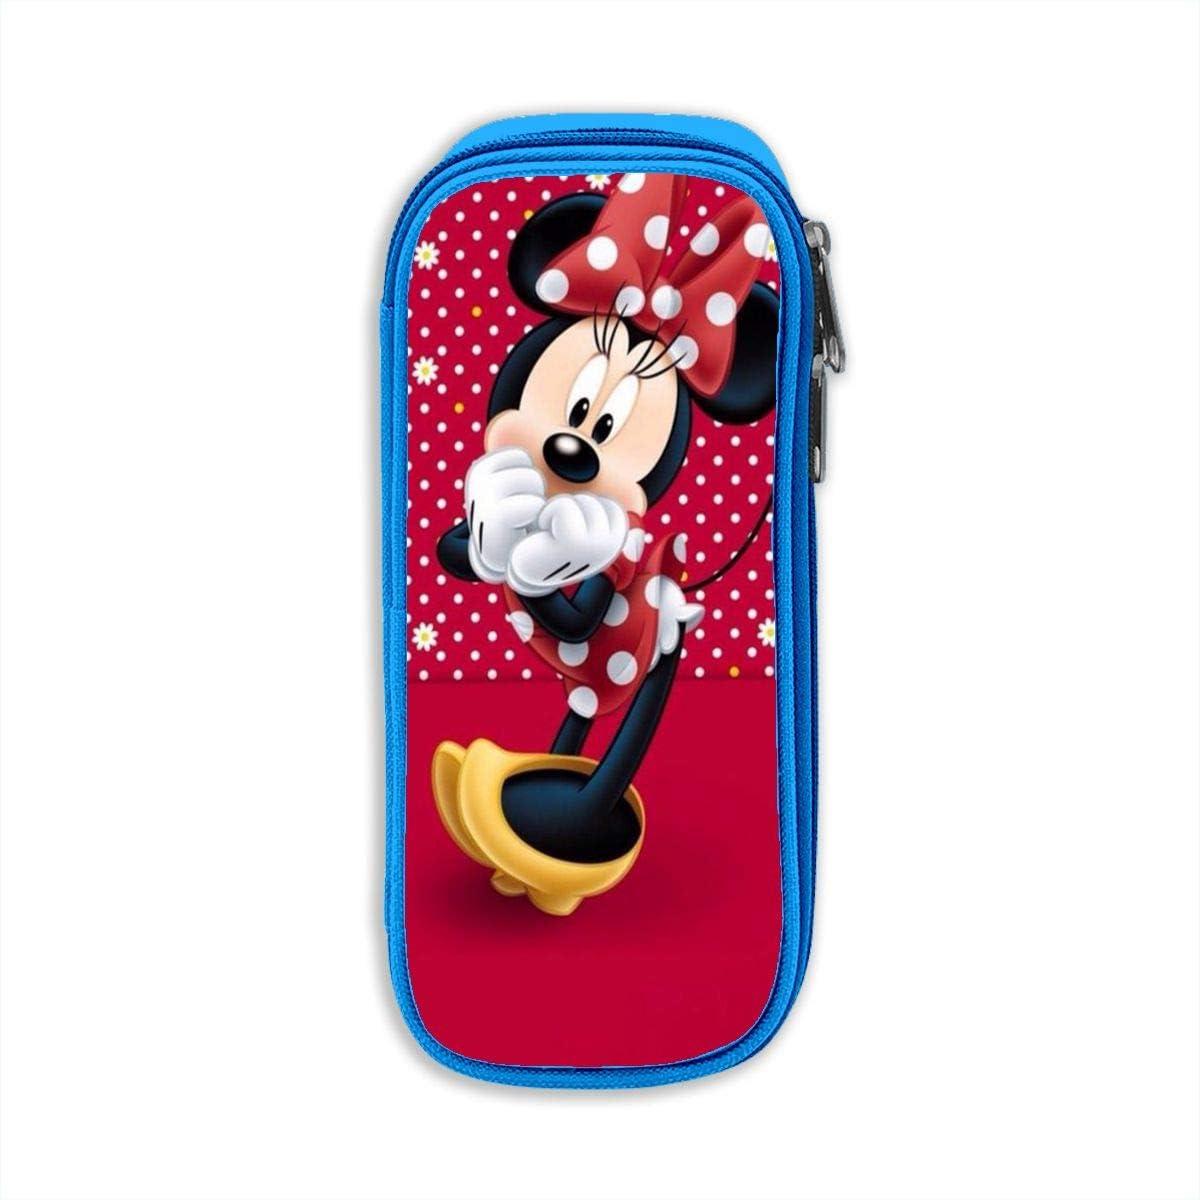 MPJTJGWZ - Estuche para lápices, diseño de Minnie Mouse: Amazon.es: Hogar